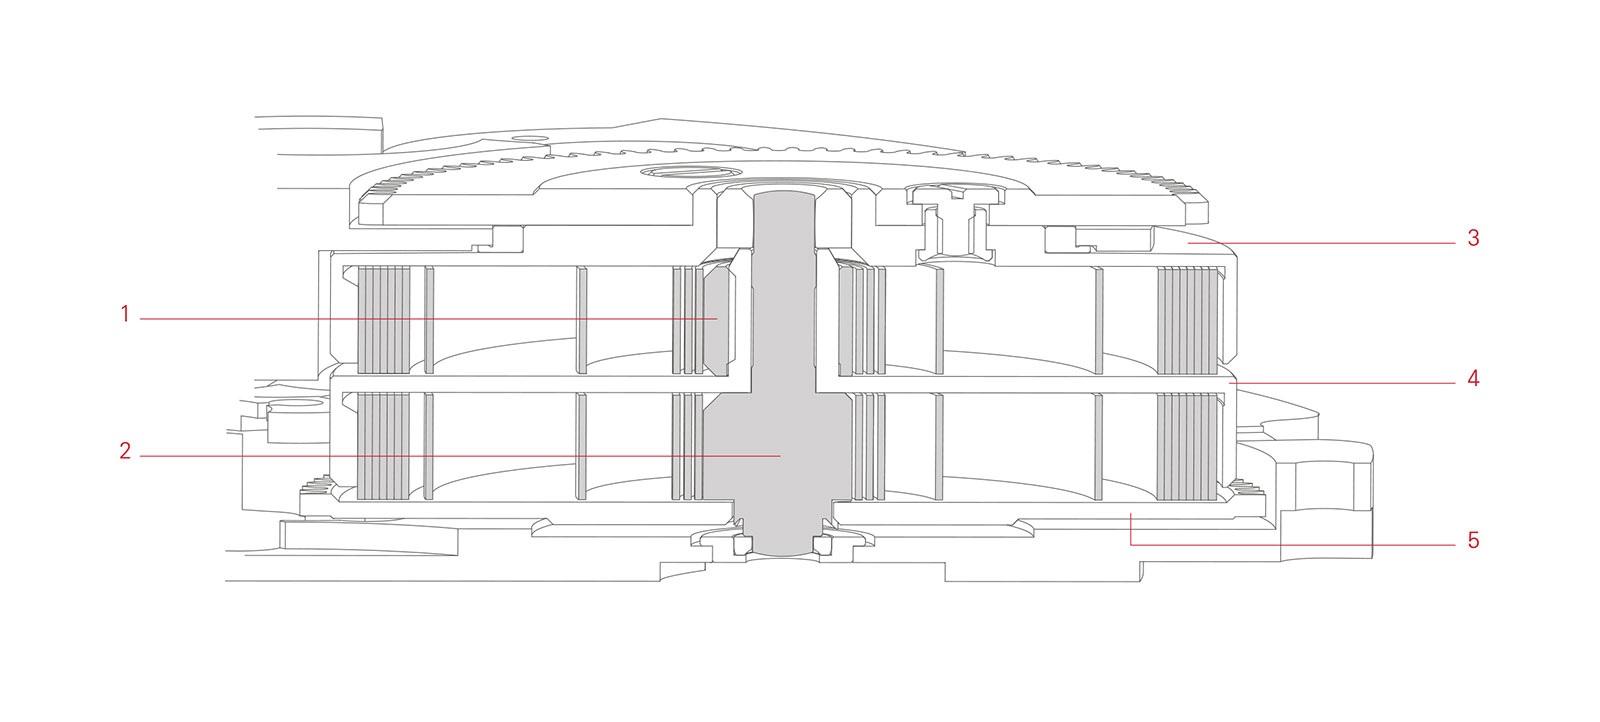 caliber l043.8 of the zeitwerk date mainspring barrel design